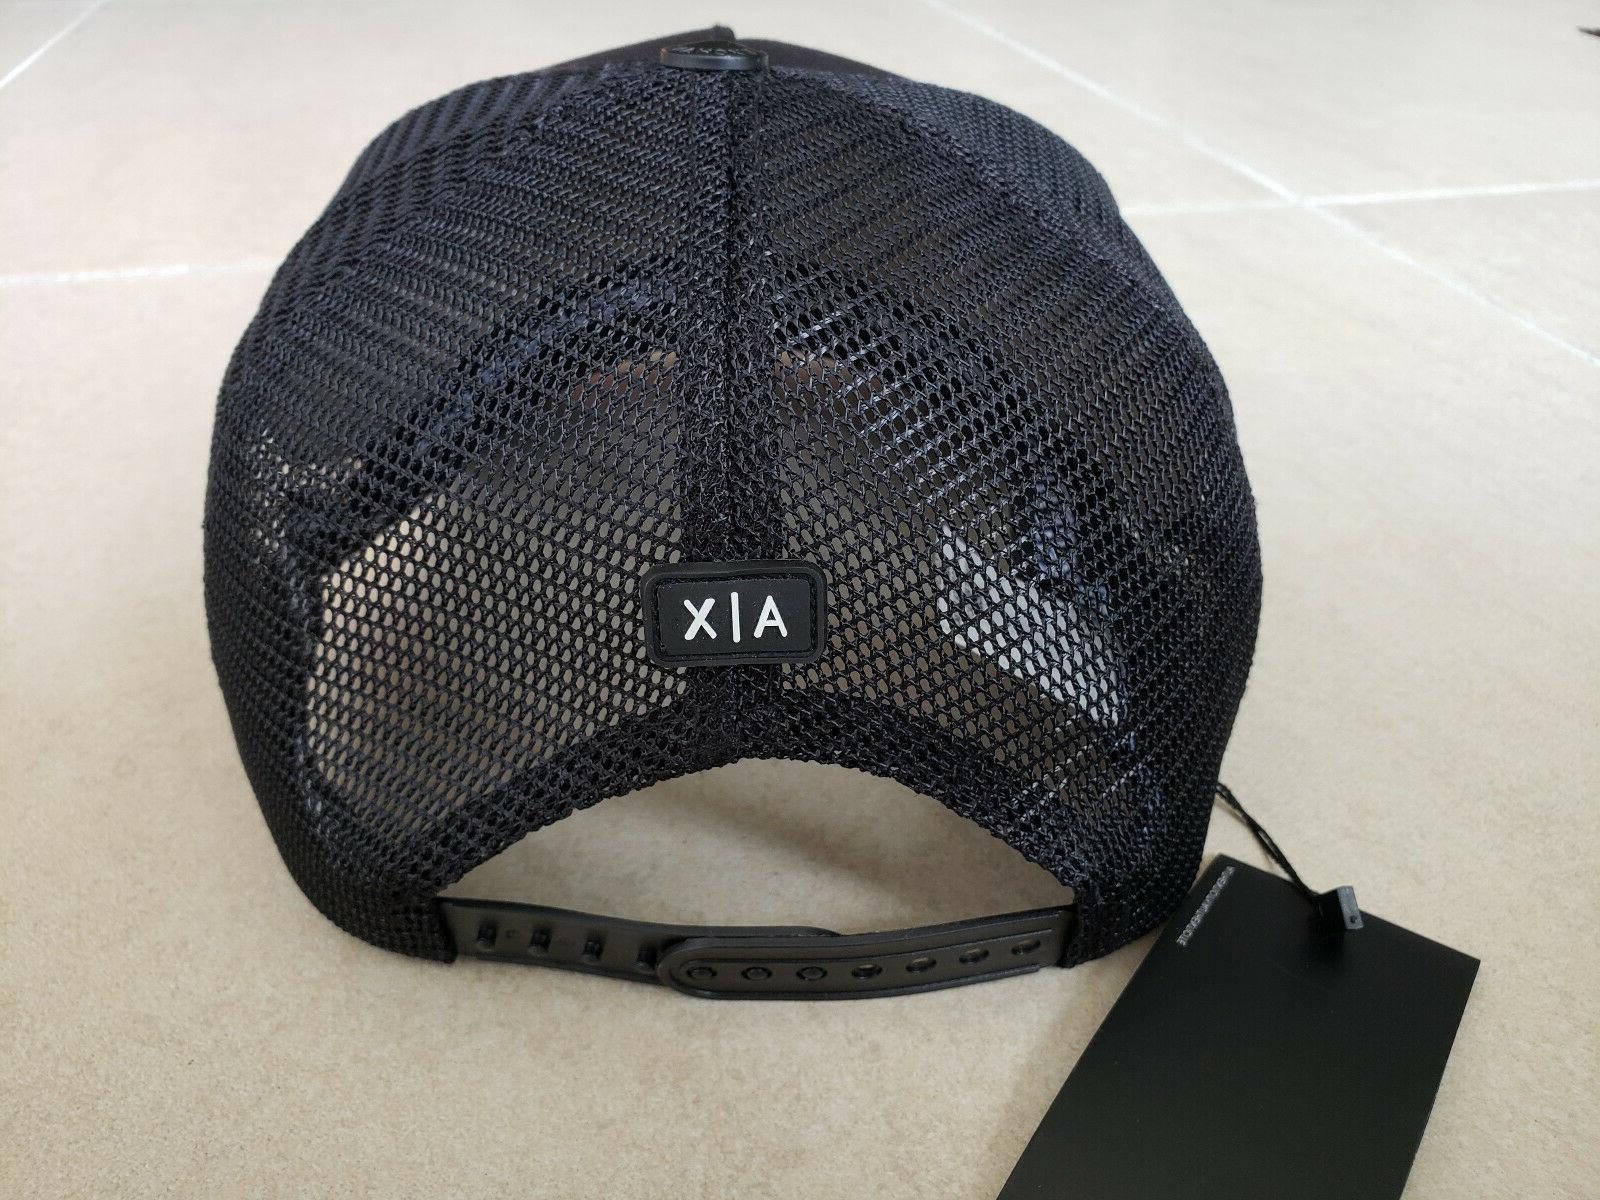 Armani A|X Black Baseball Cap/Hat